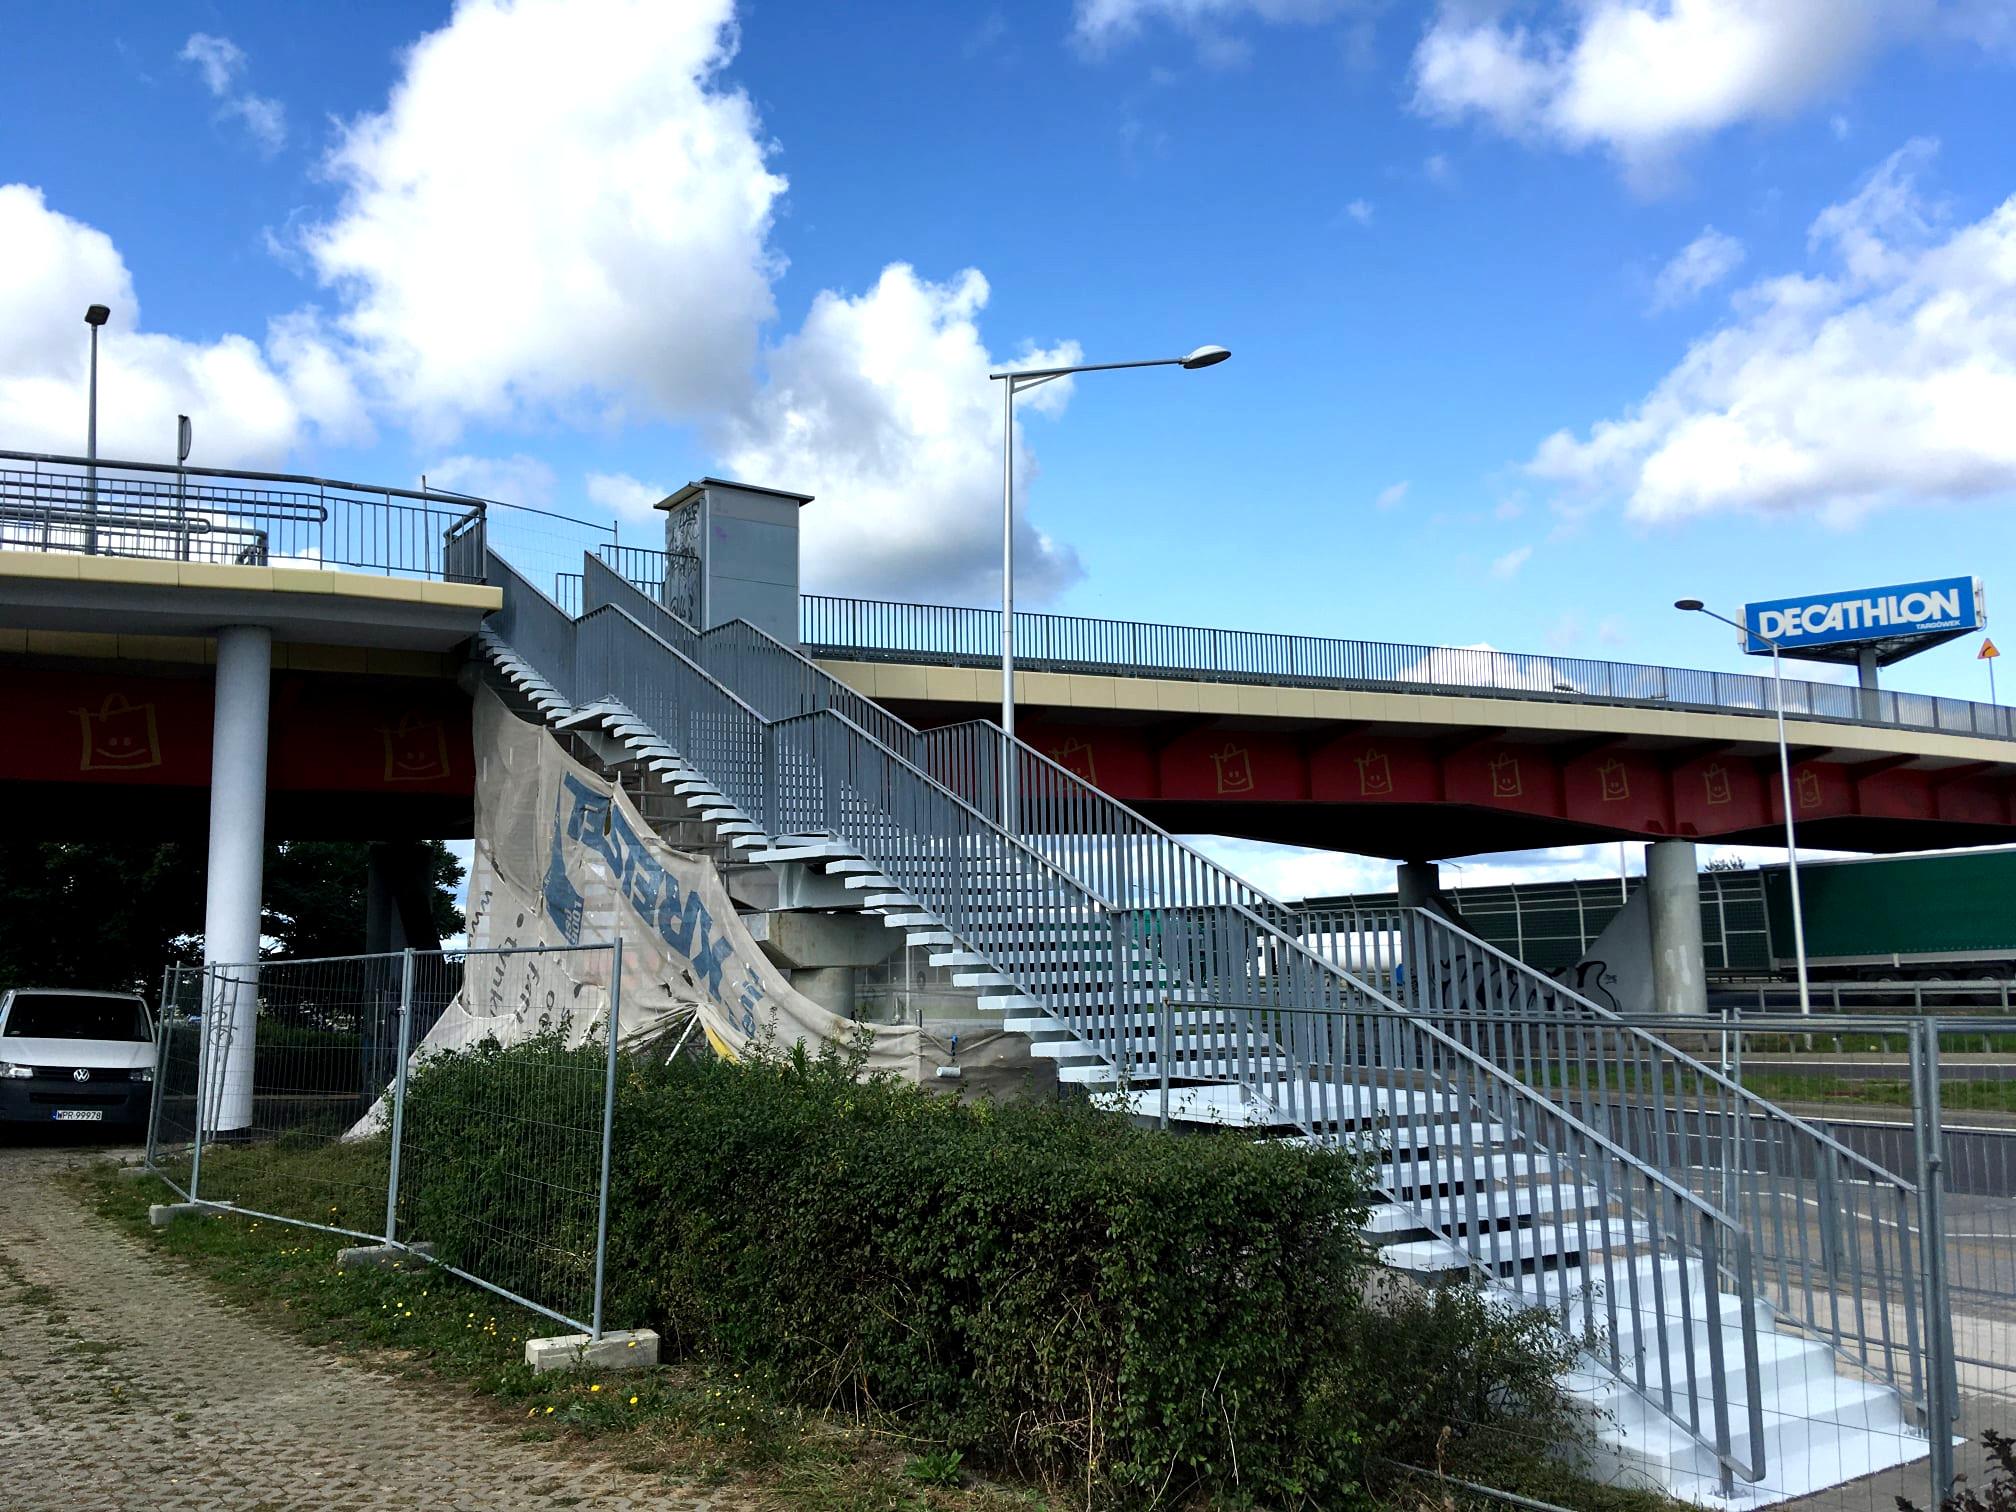 Arpro remont wiaduktu i schodow